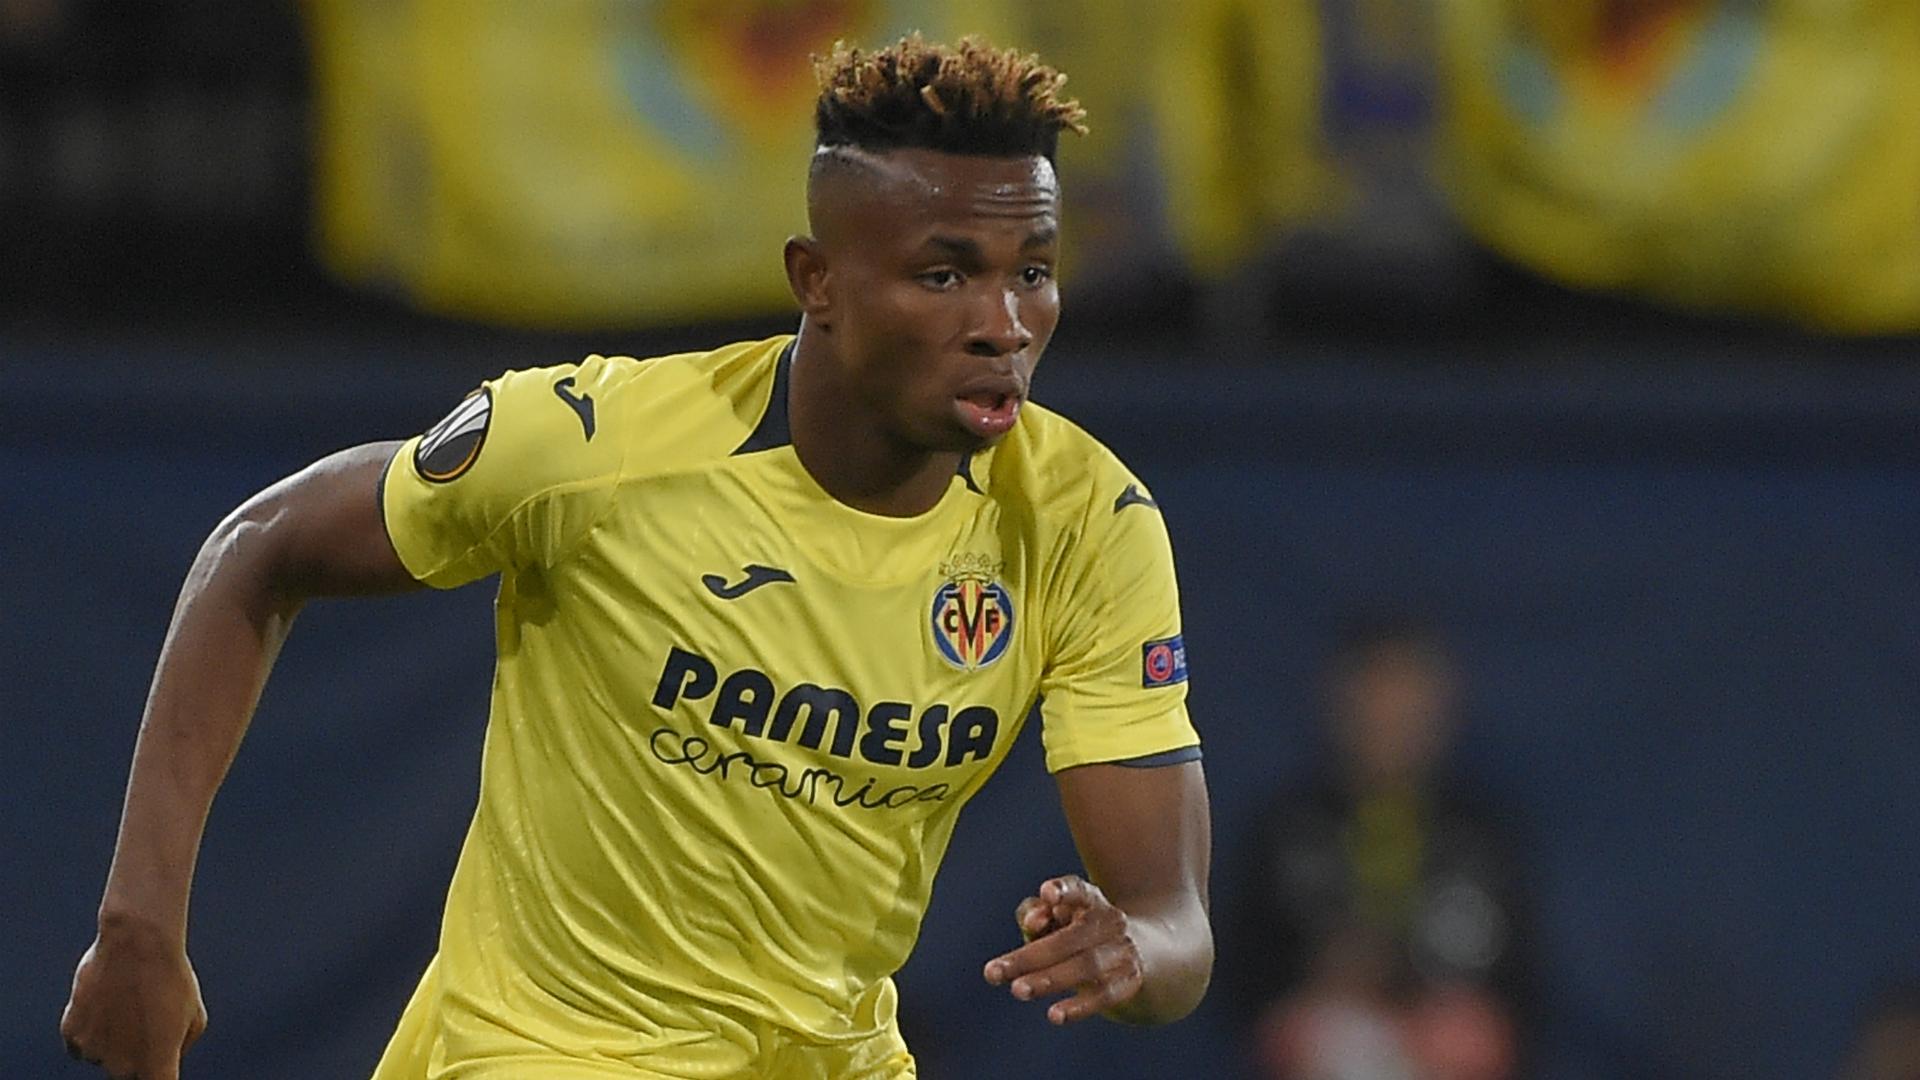 'Chukwueze is a lot like Mane' - Alberto Moreno compares Villarreal teammate to Liverpool star